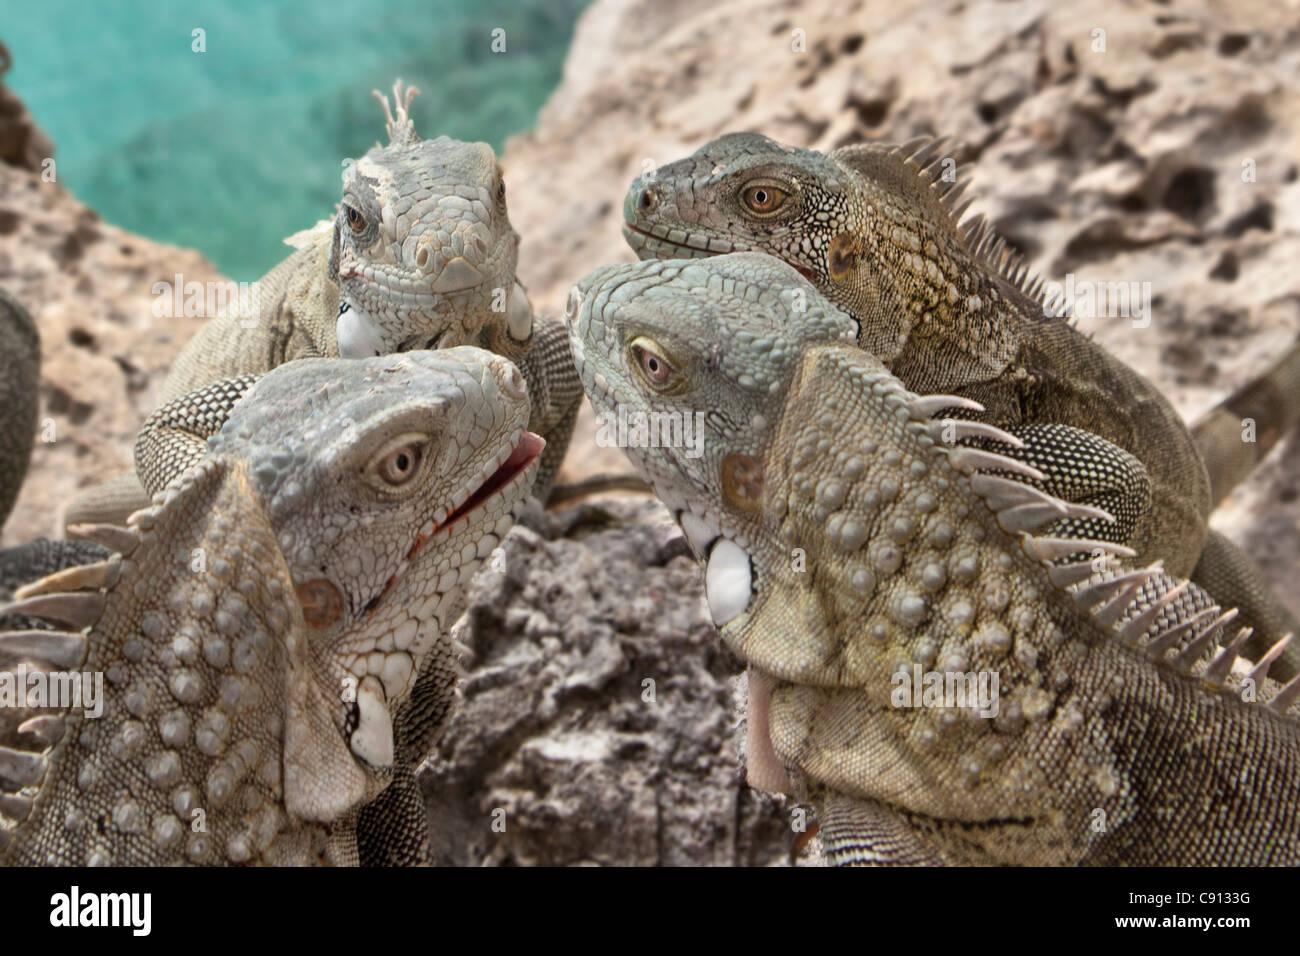 The Netherlands, Bonaire Island, Dutch Caribbean, Kralendijk, Green Iguana ( Iguana iguana ). - Stock Image